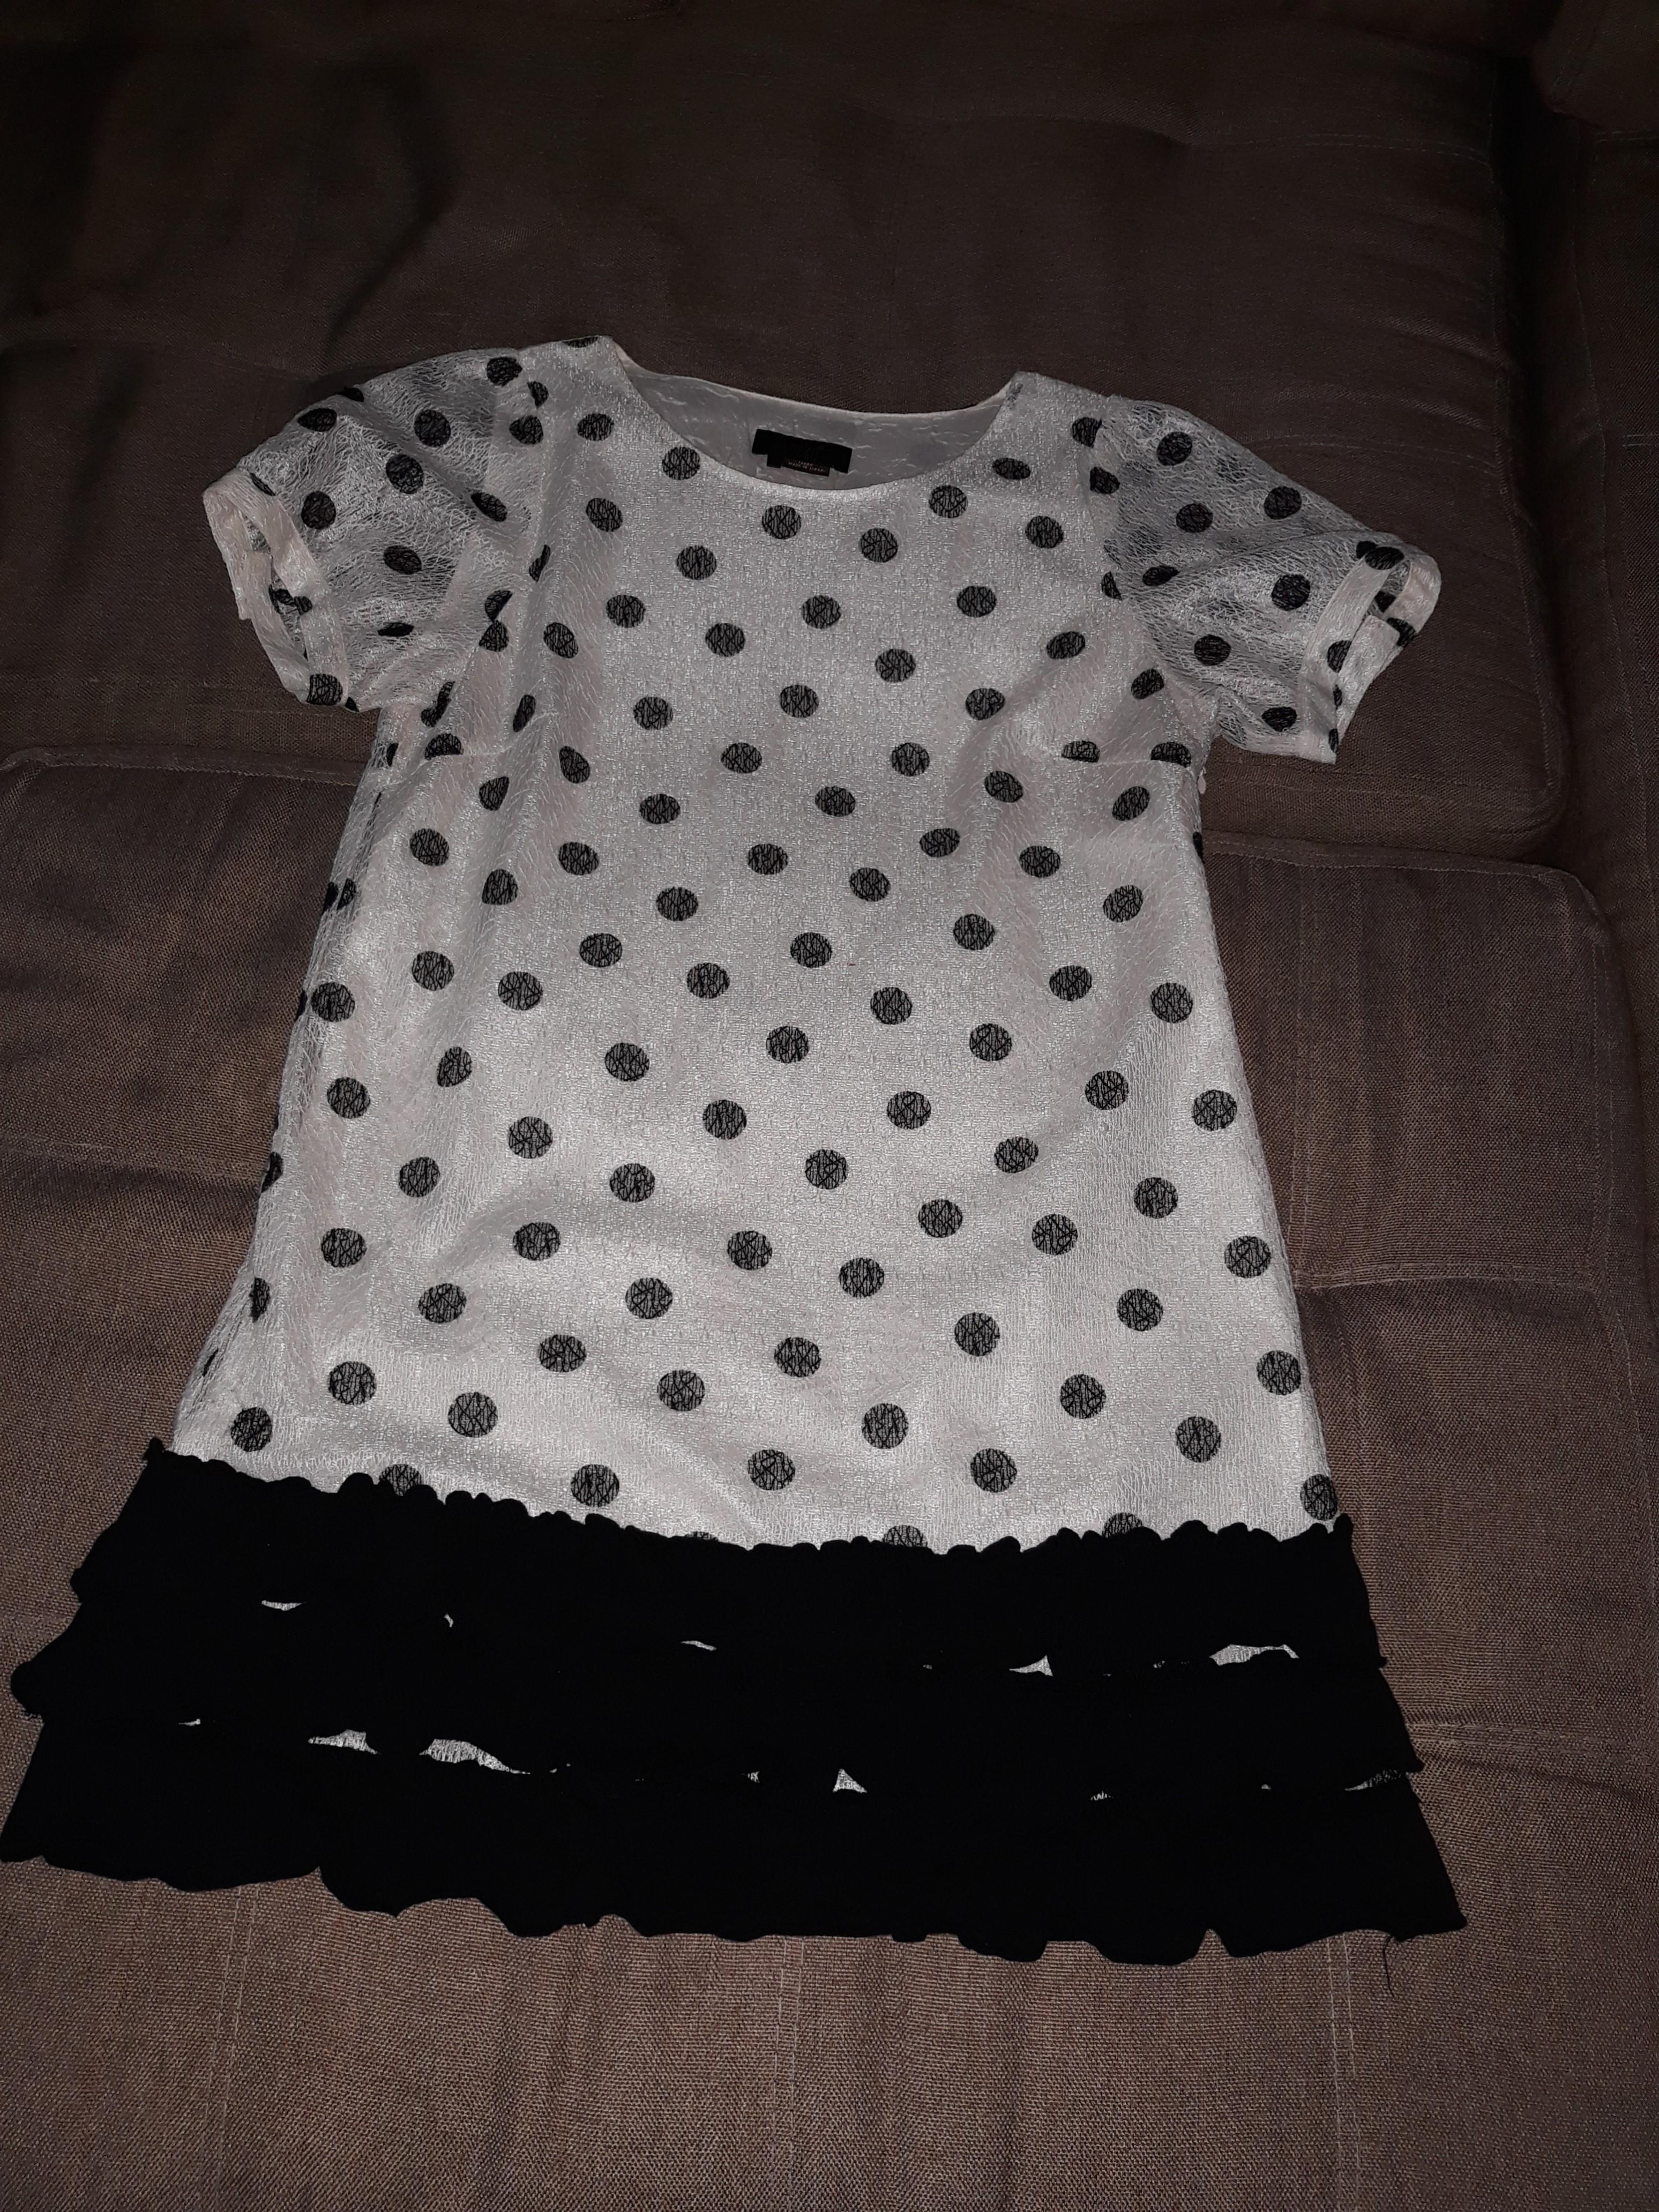 Japan brand short cute dress